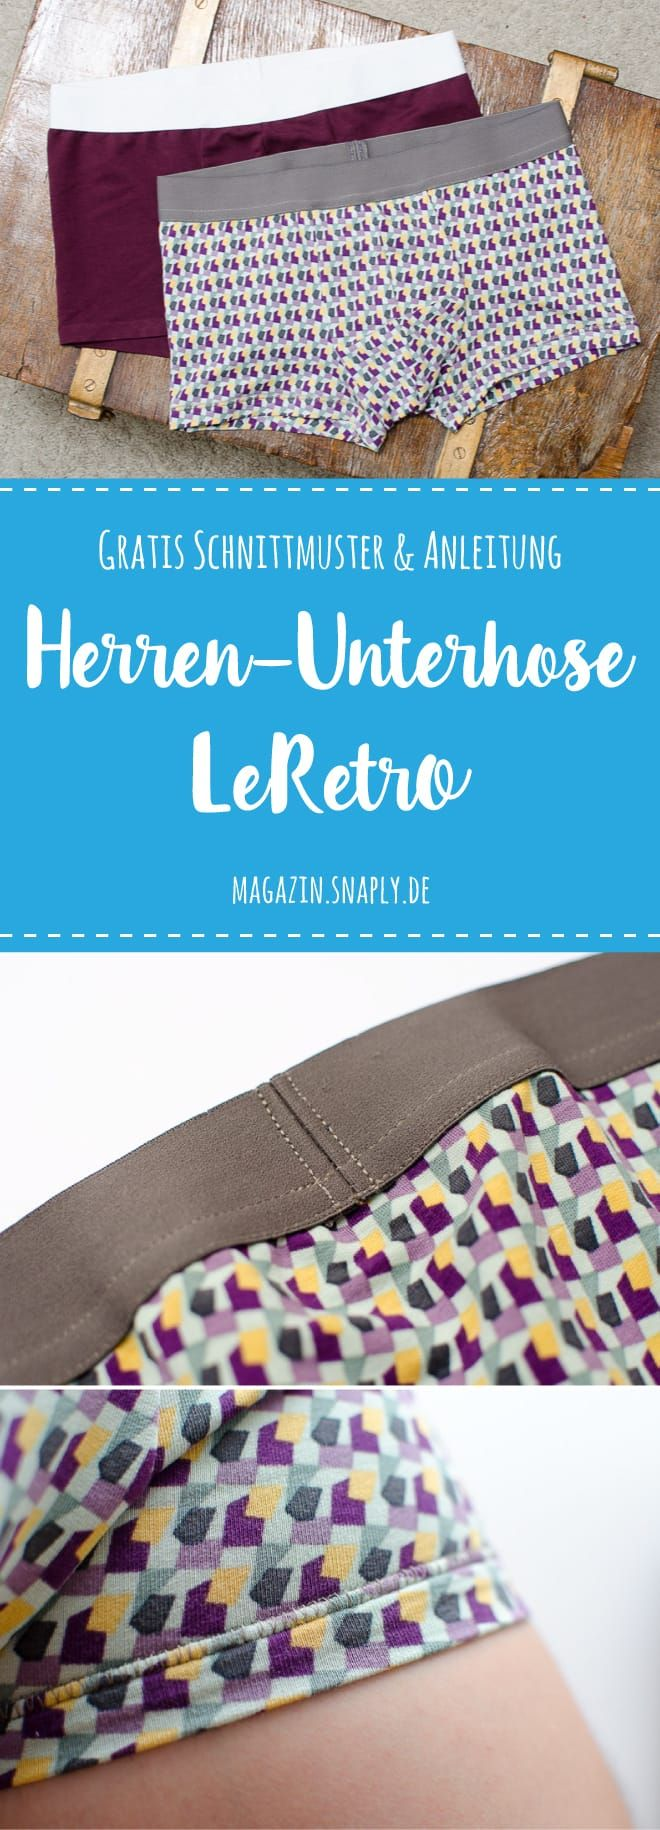 Kostenloses Schnittmuster: Herren-Unterhose LeRetro | Snaply-Magazin #gratisschnittmuster